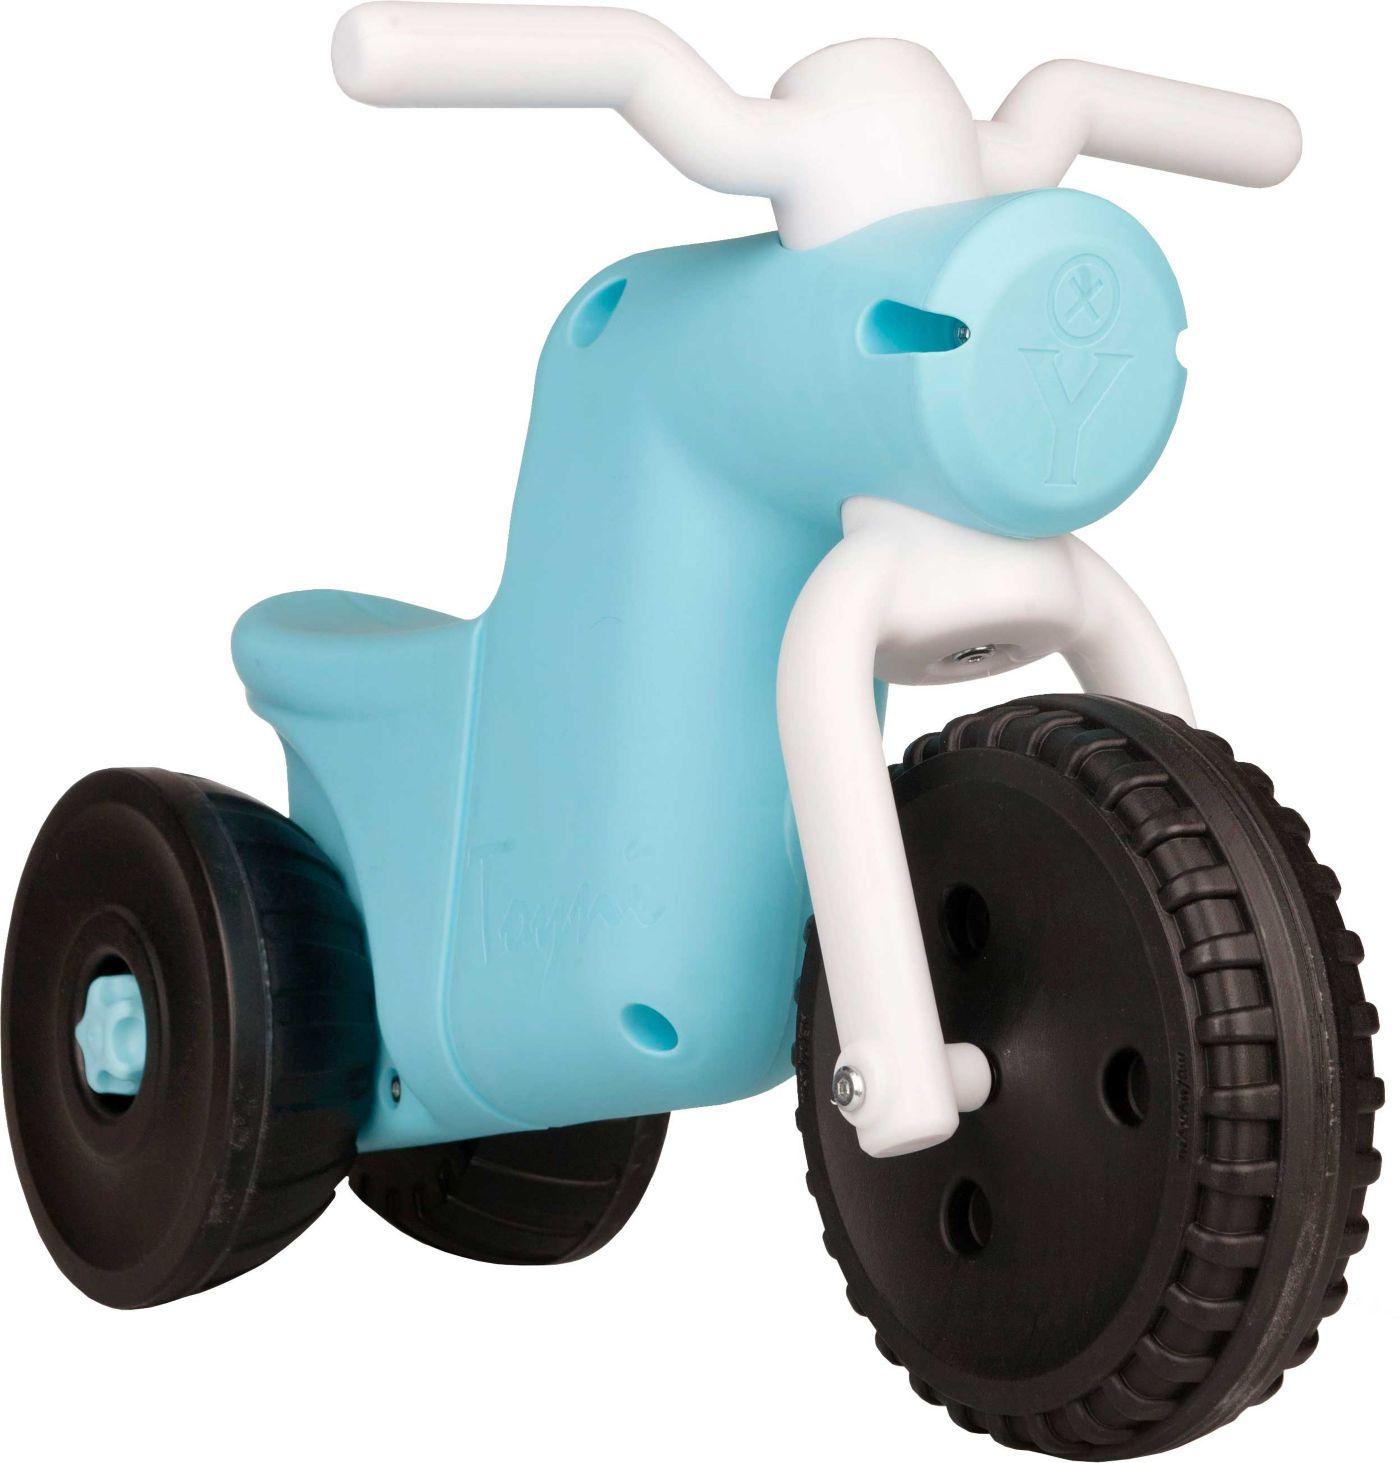 YBike Toyni 2-in-1 Balance Bike